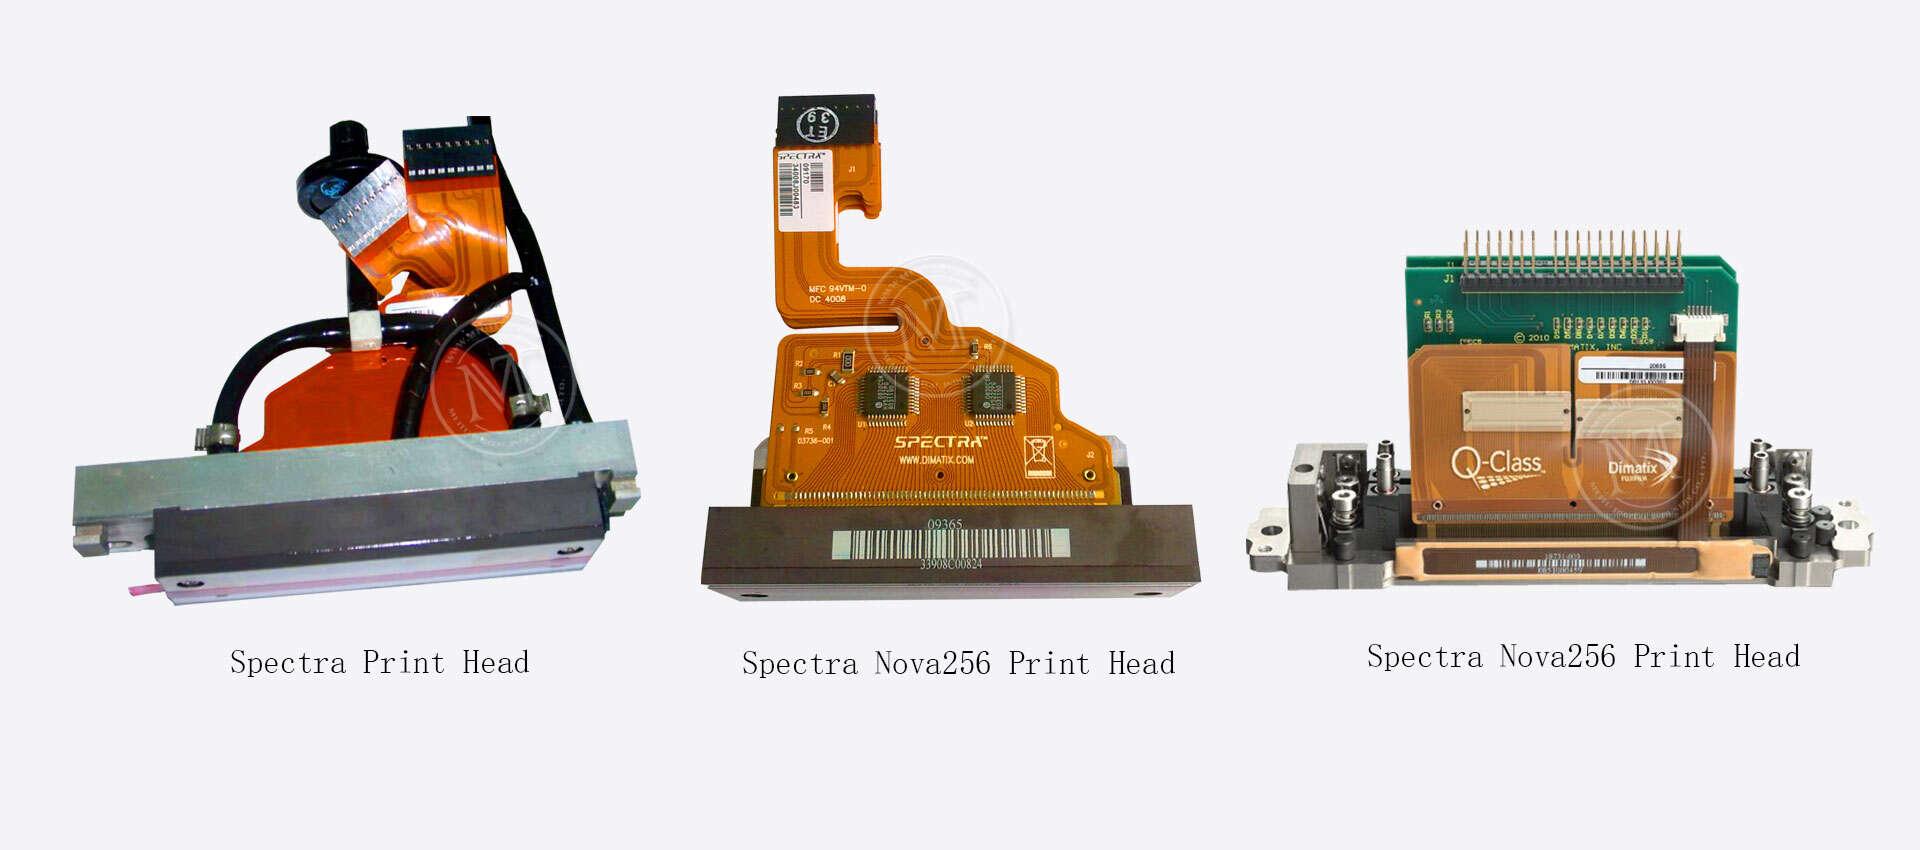 Spectra Polaris Printhead Supplier - MTuTech com